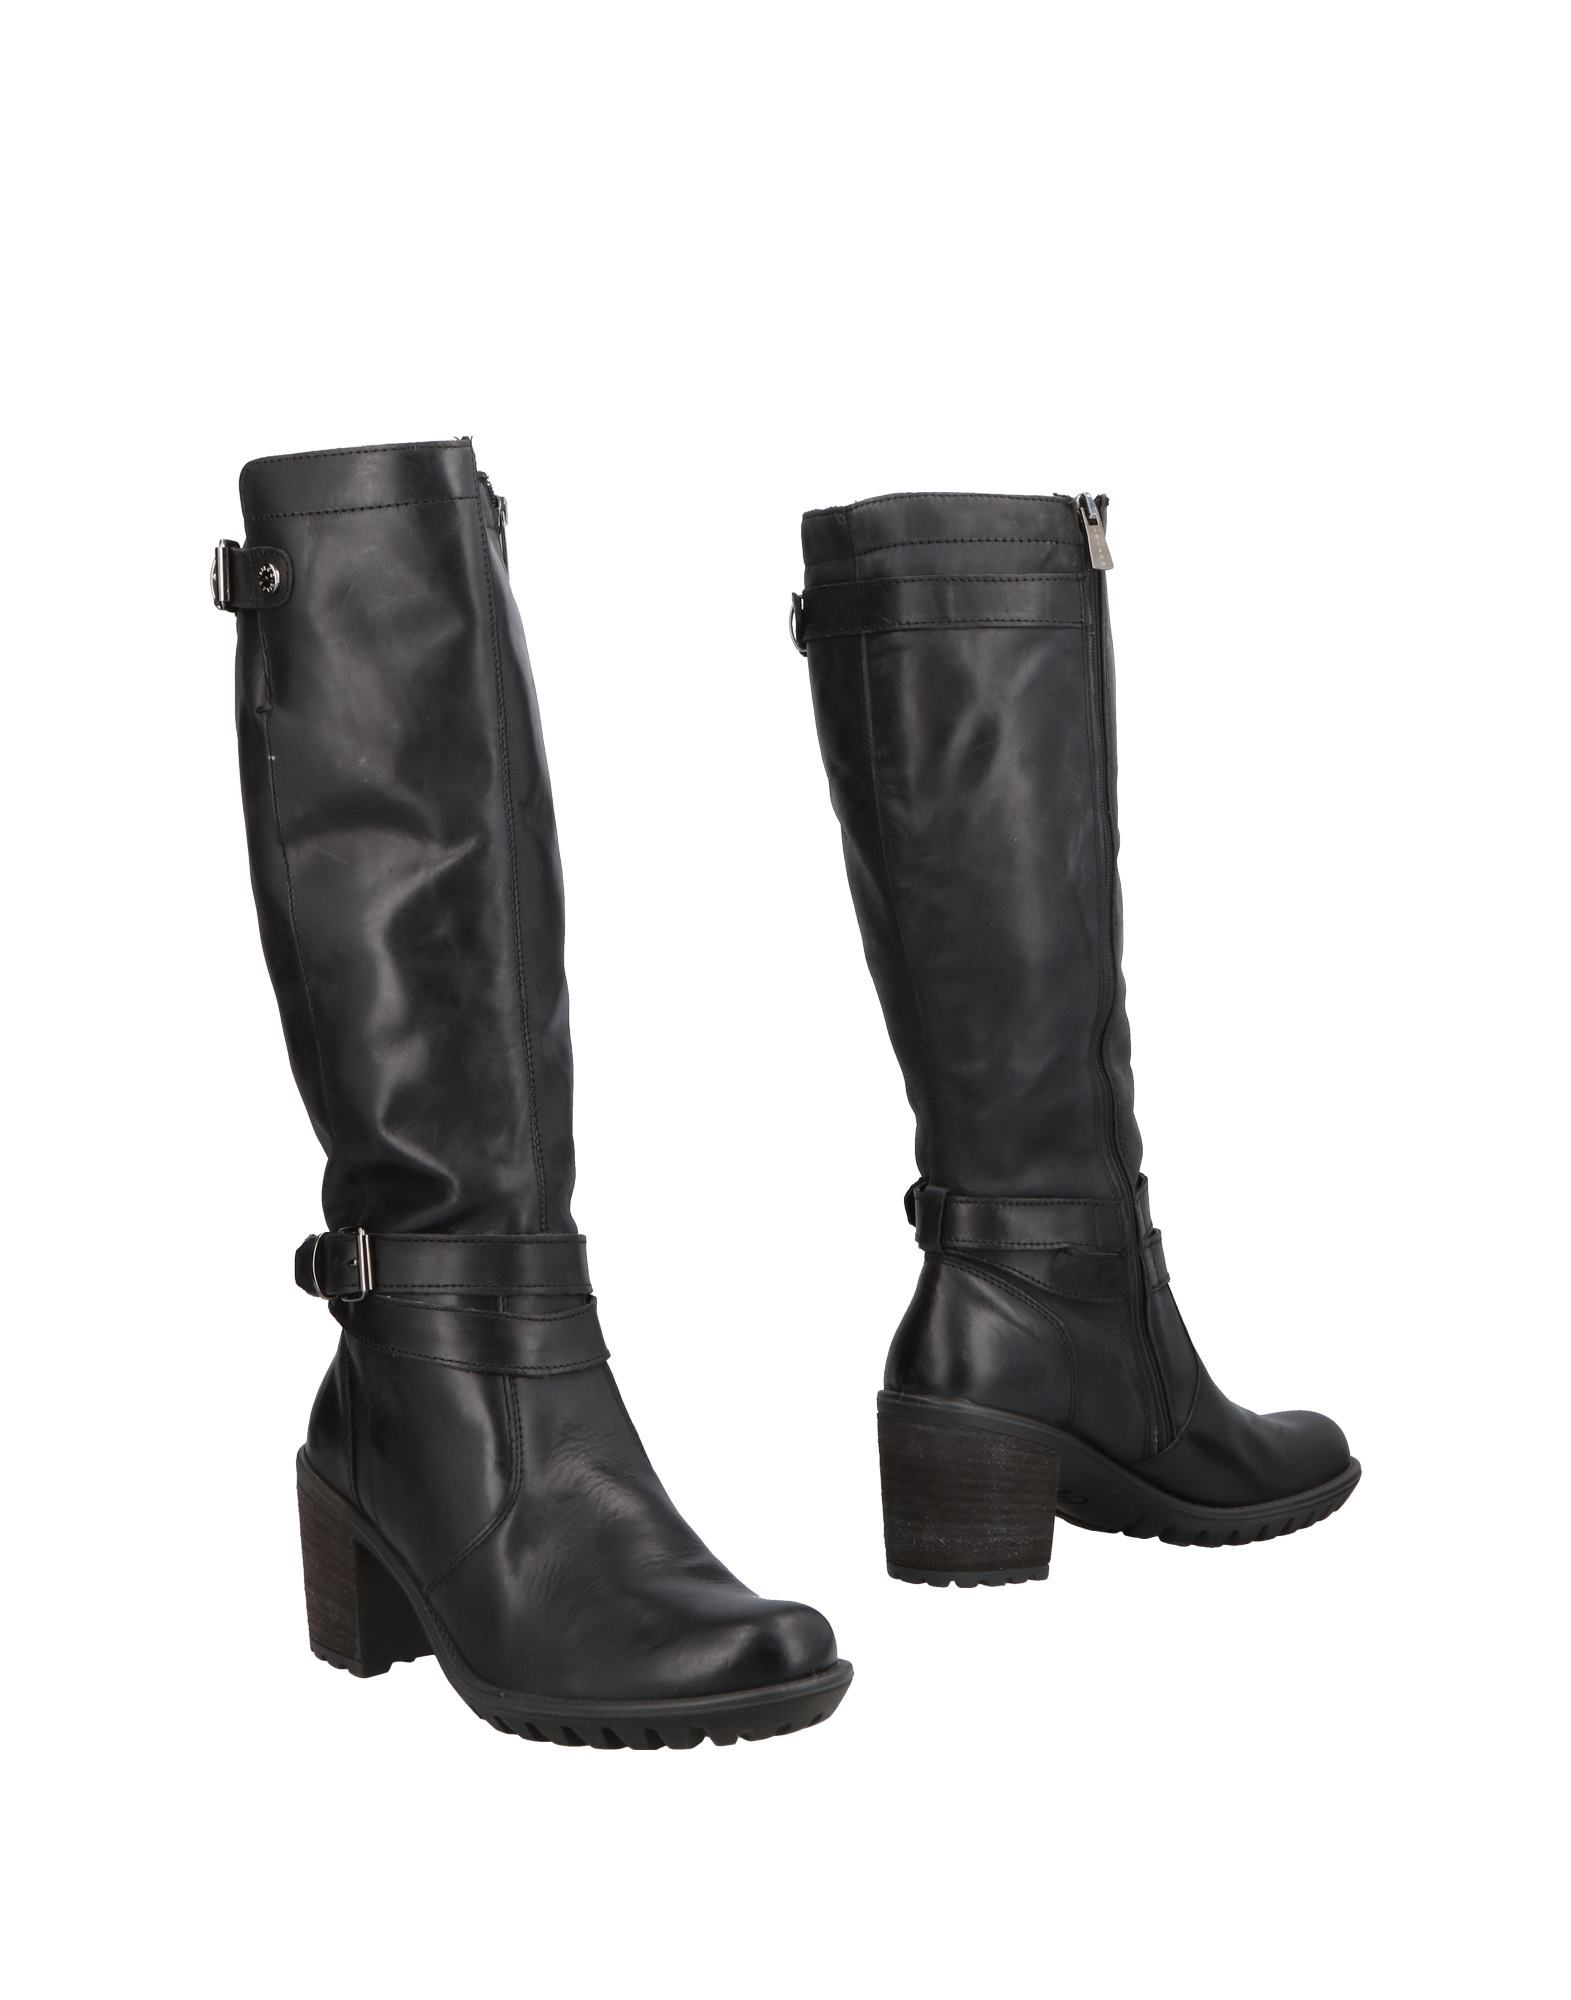 Igi&Co Stiefel Damen  11504529DH Gute Qualität beliebte Schuhe Schuhe Schuhe 86102e